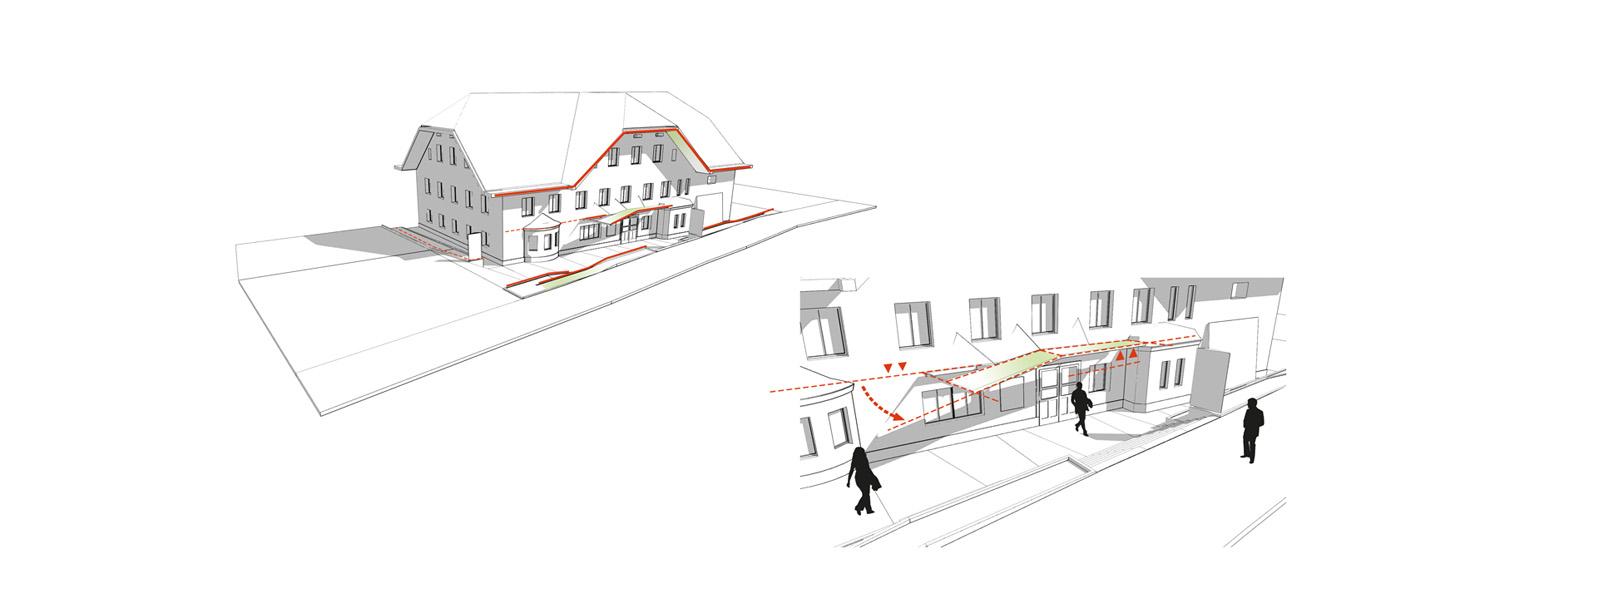 rbs vorplatz gp architektur. Black Bedroom Furniture Sets. Home Design Ideas